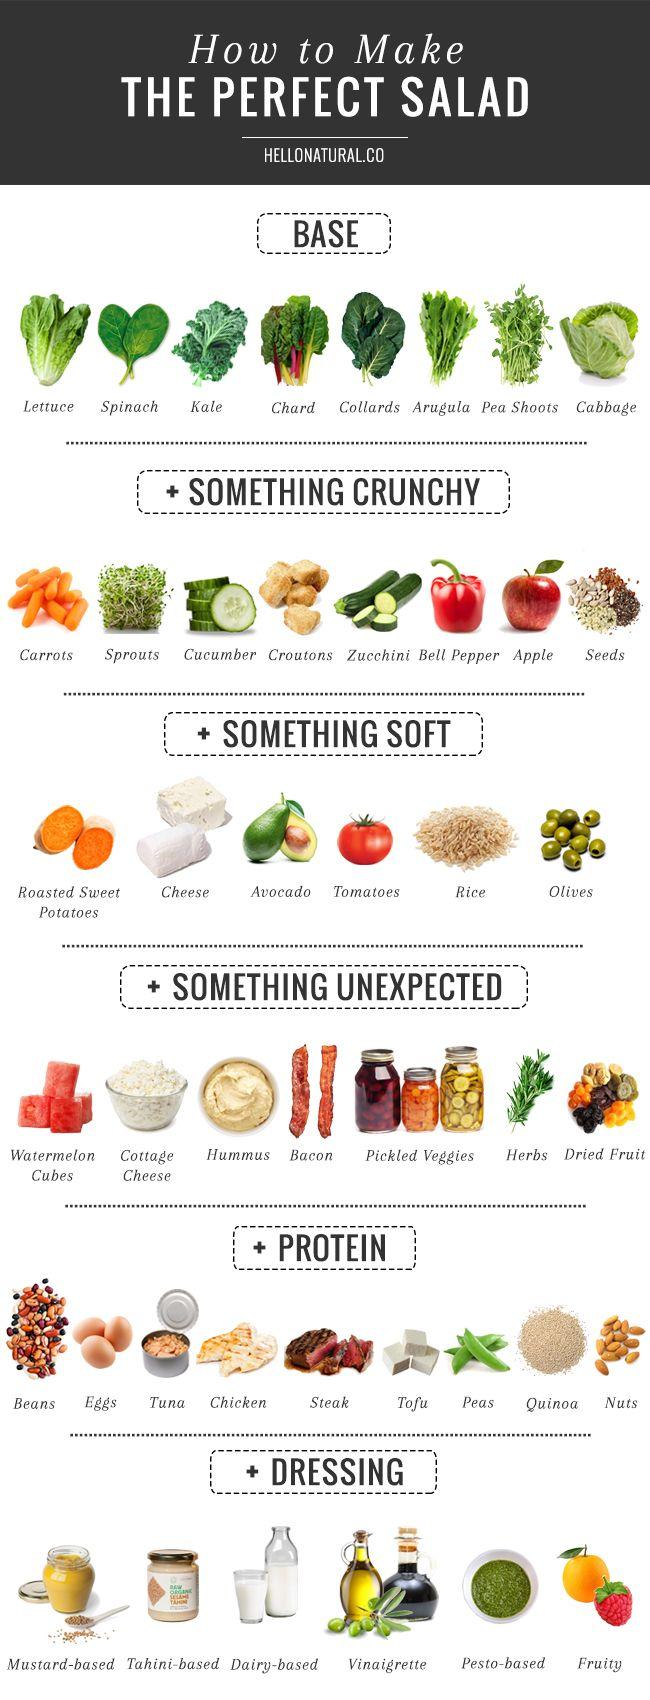 Our No-Fail Formula for Non-Boring Salads | http://helloglow.co/no-fail-plan-how-to-make-the-perfect-salad/